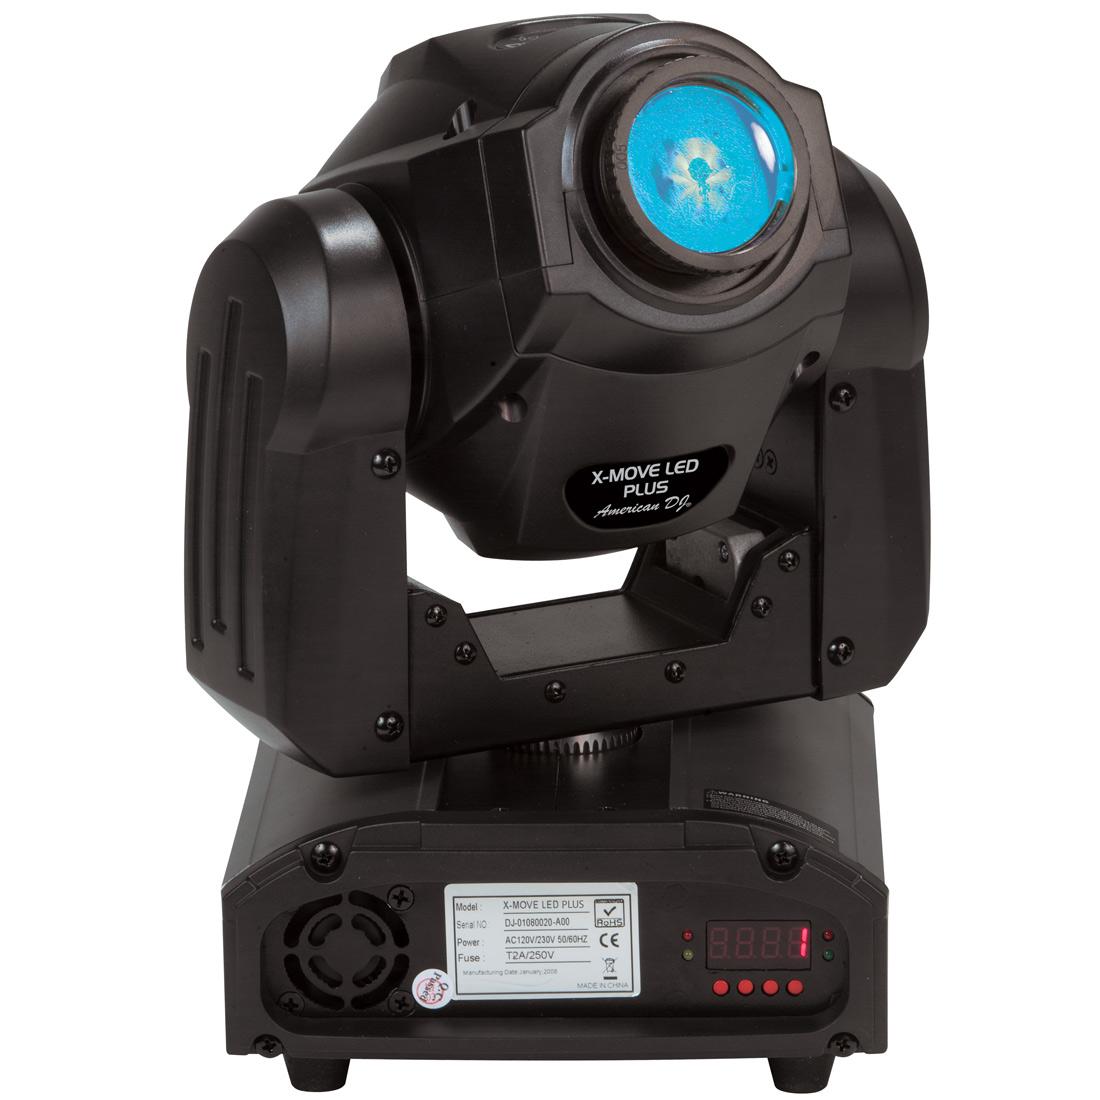 X-Move LED PLus